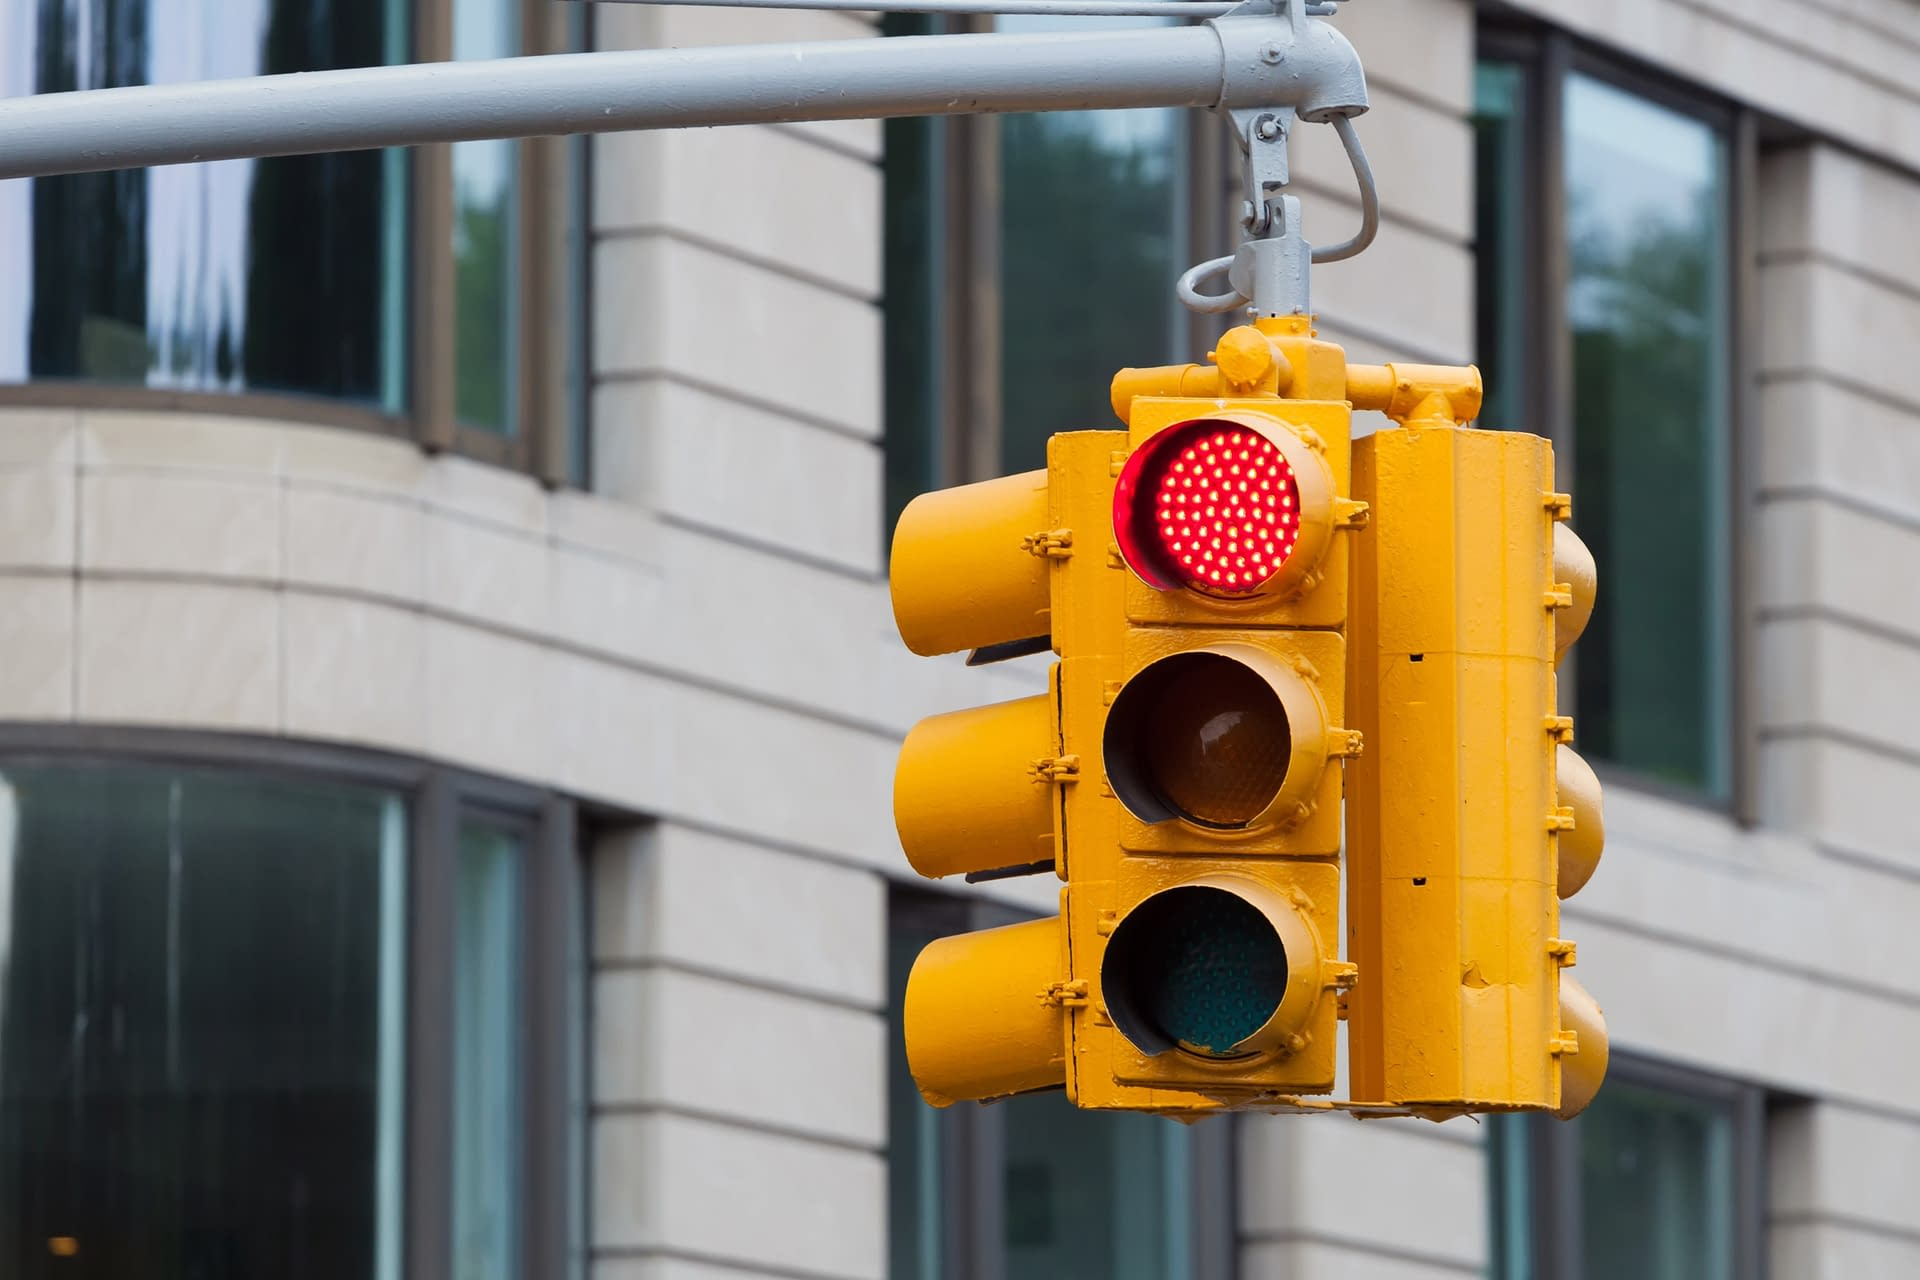 Traffic light in New York City, USA.